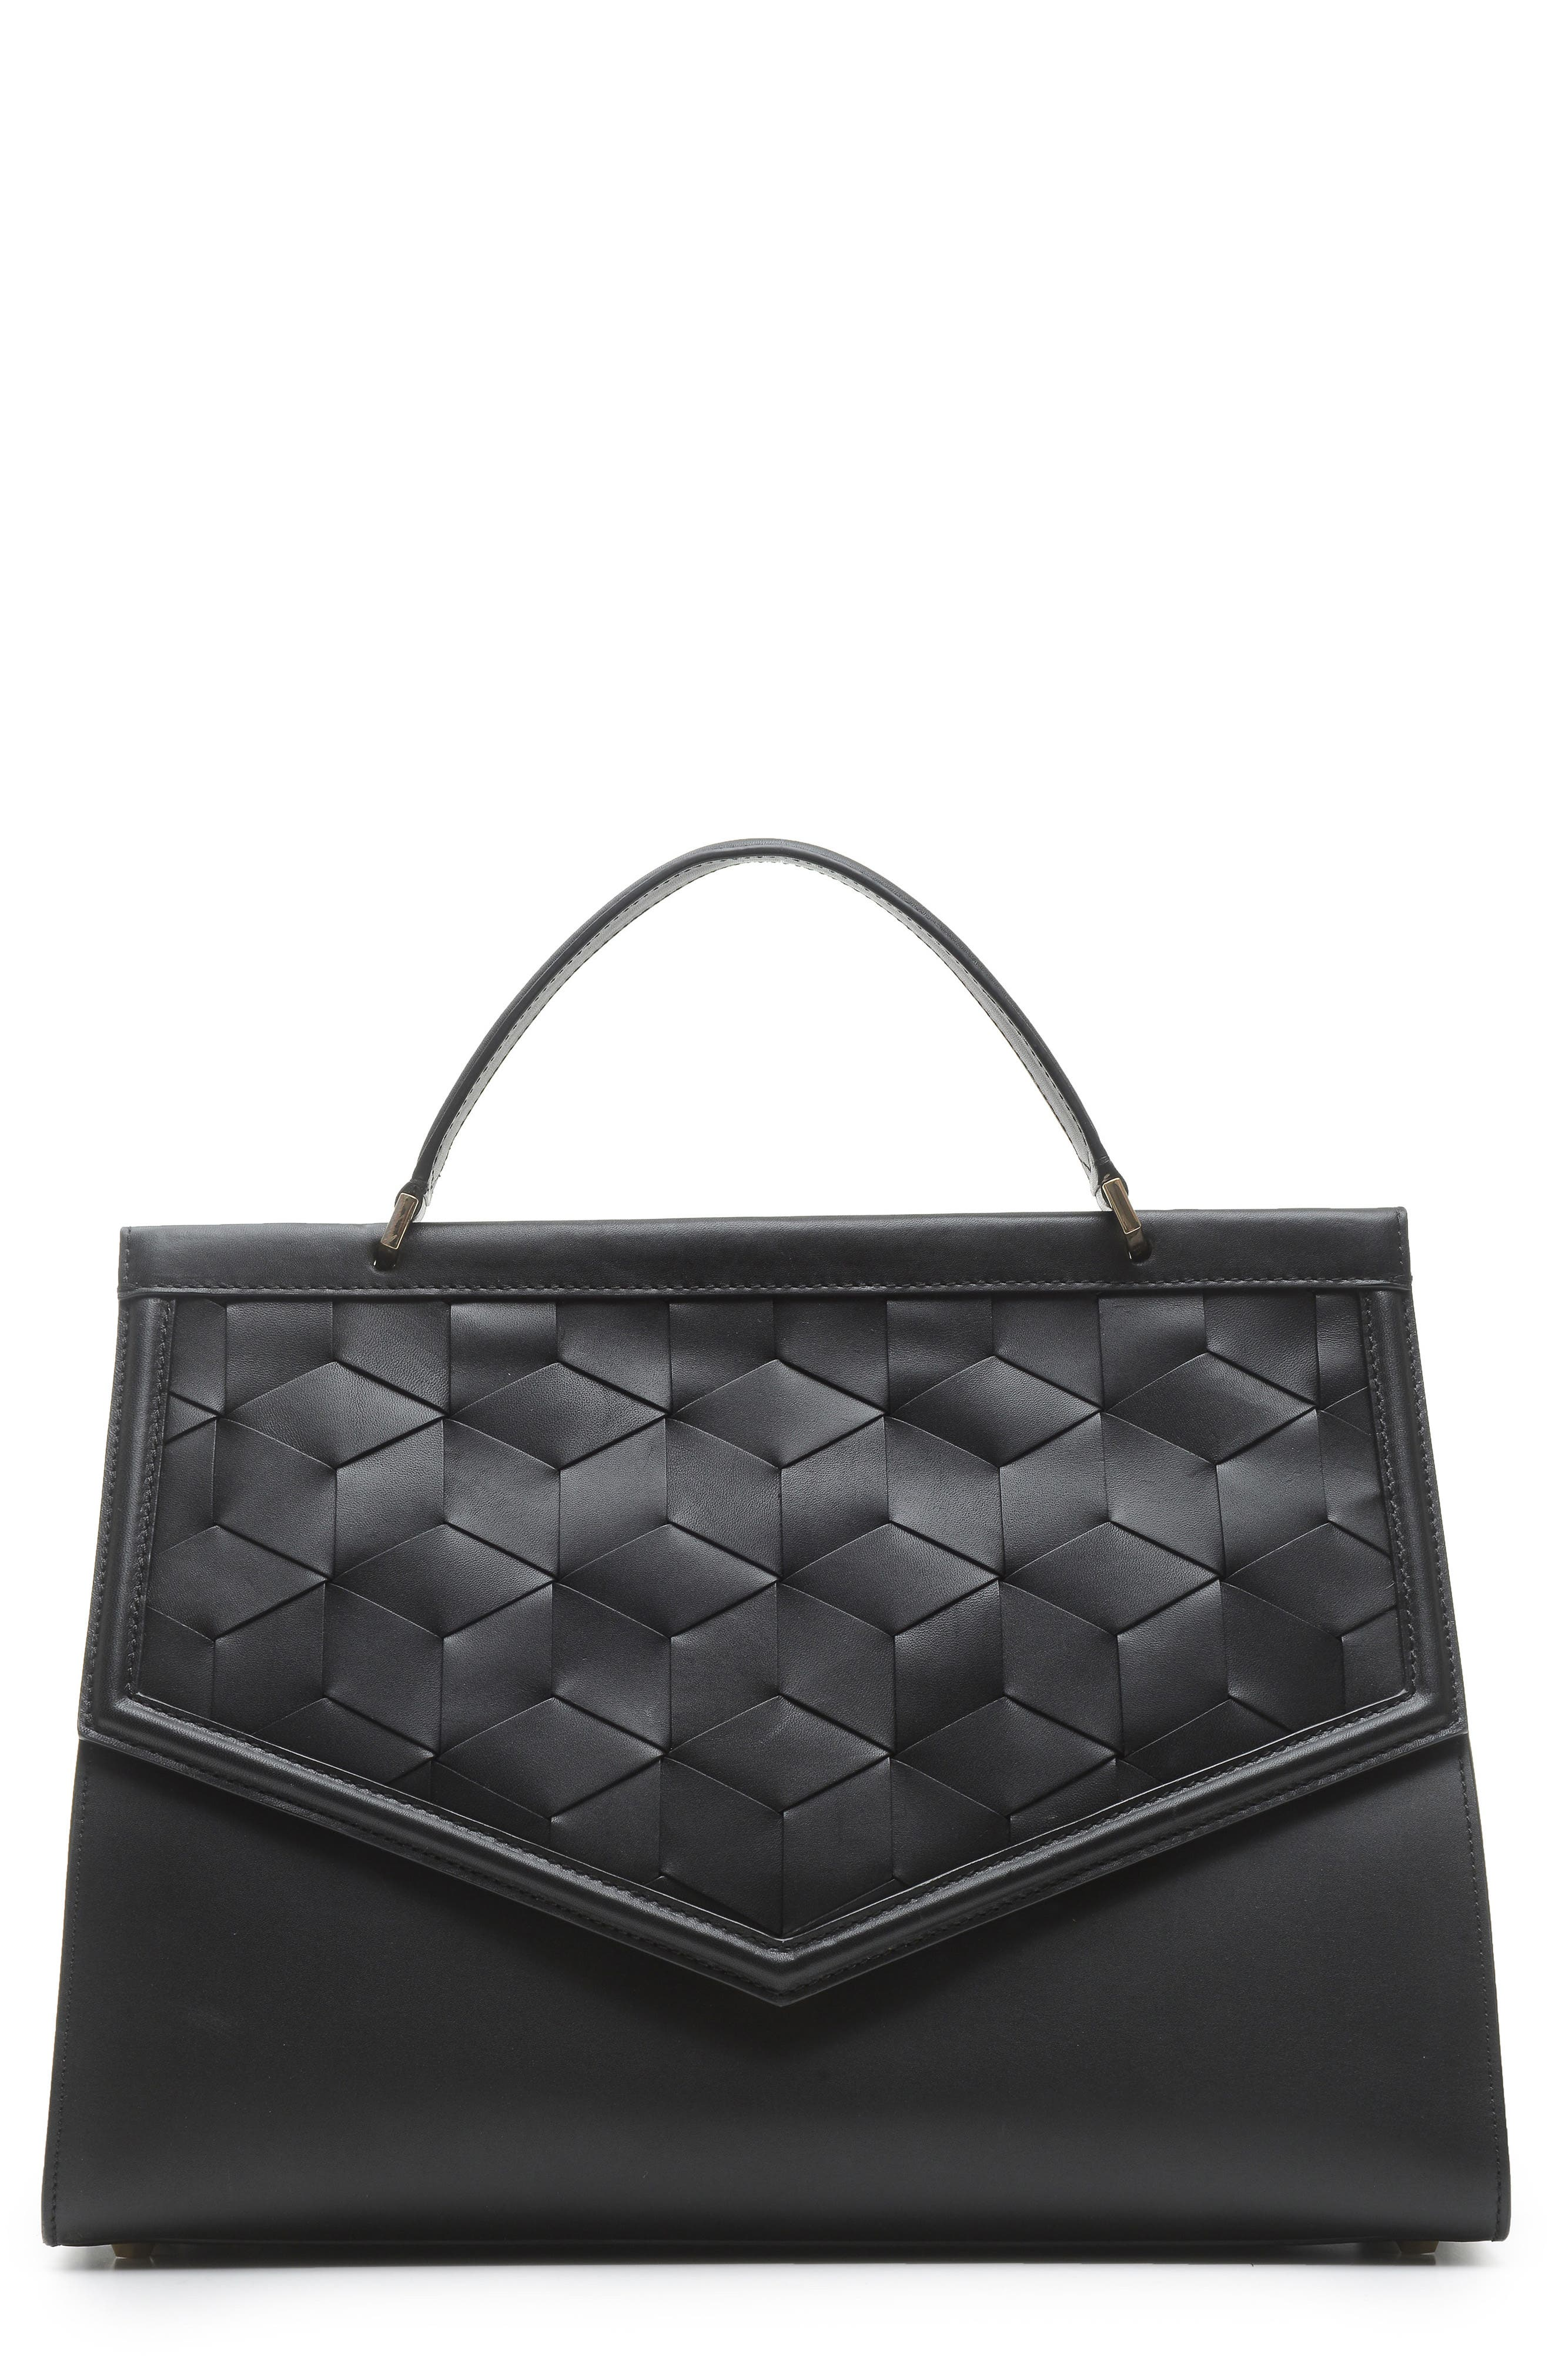 Wayfare Calfskin Leather Top Handle Satchel,                             Main thumbnail 1, color,                             BLACK